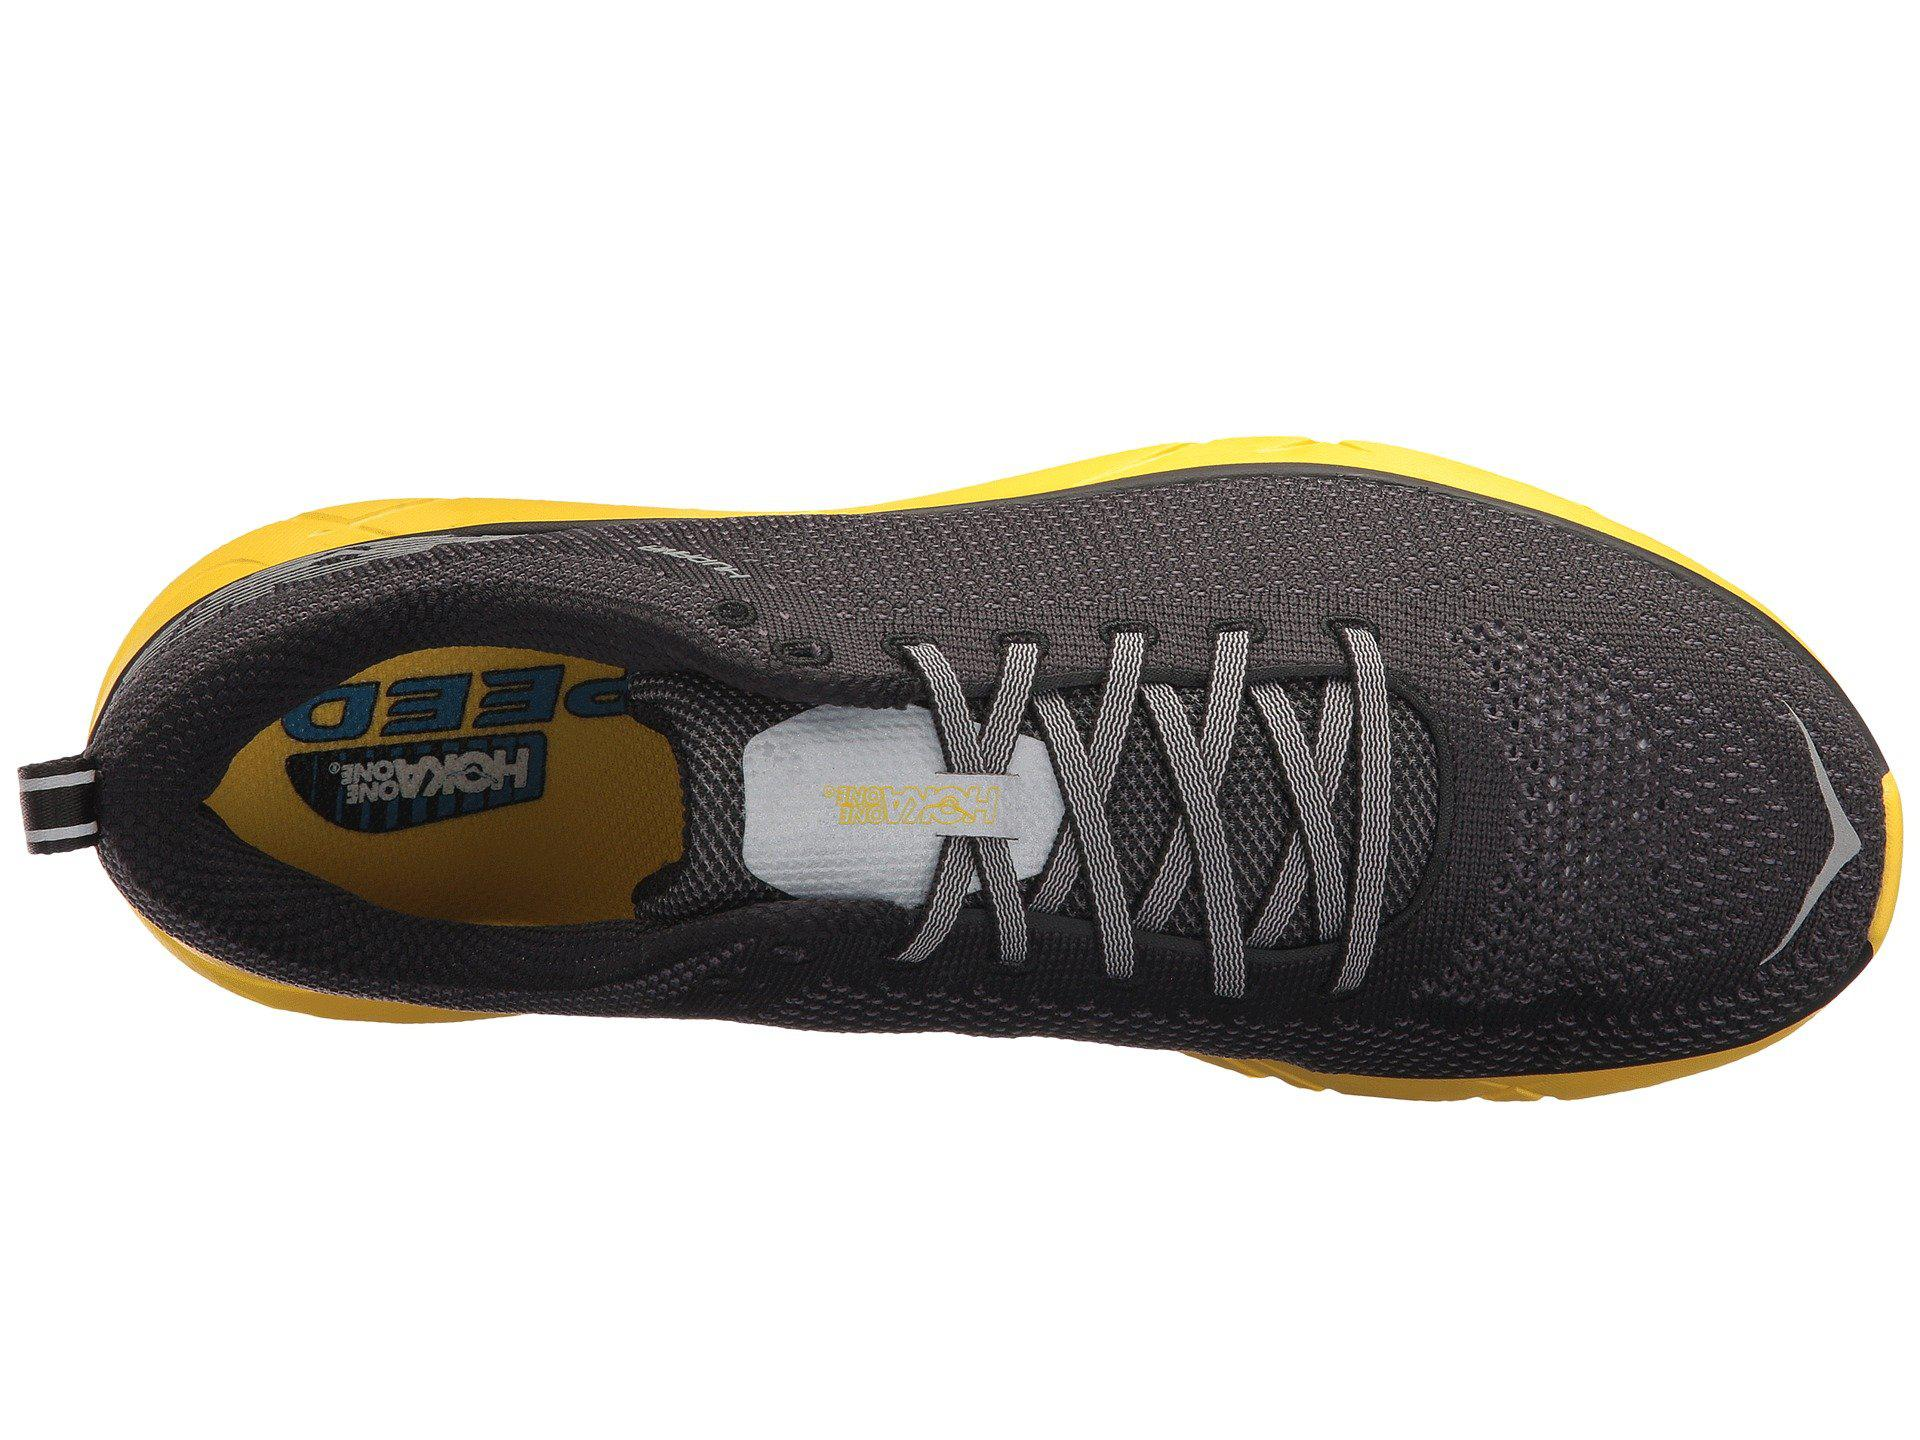 7bcc408e774a7 Hoka One One Multicolor Hupana 2 (black/blackened Pearl) Men's Running  Shoes for men